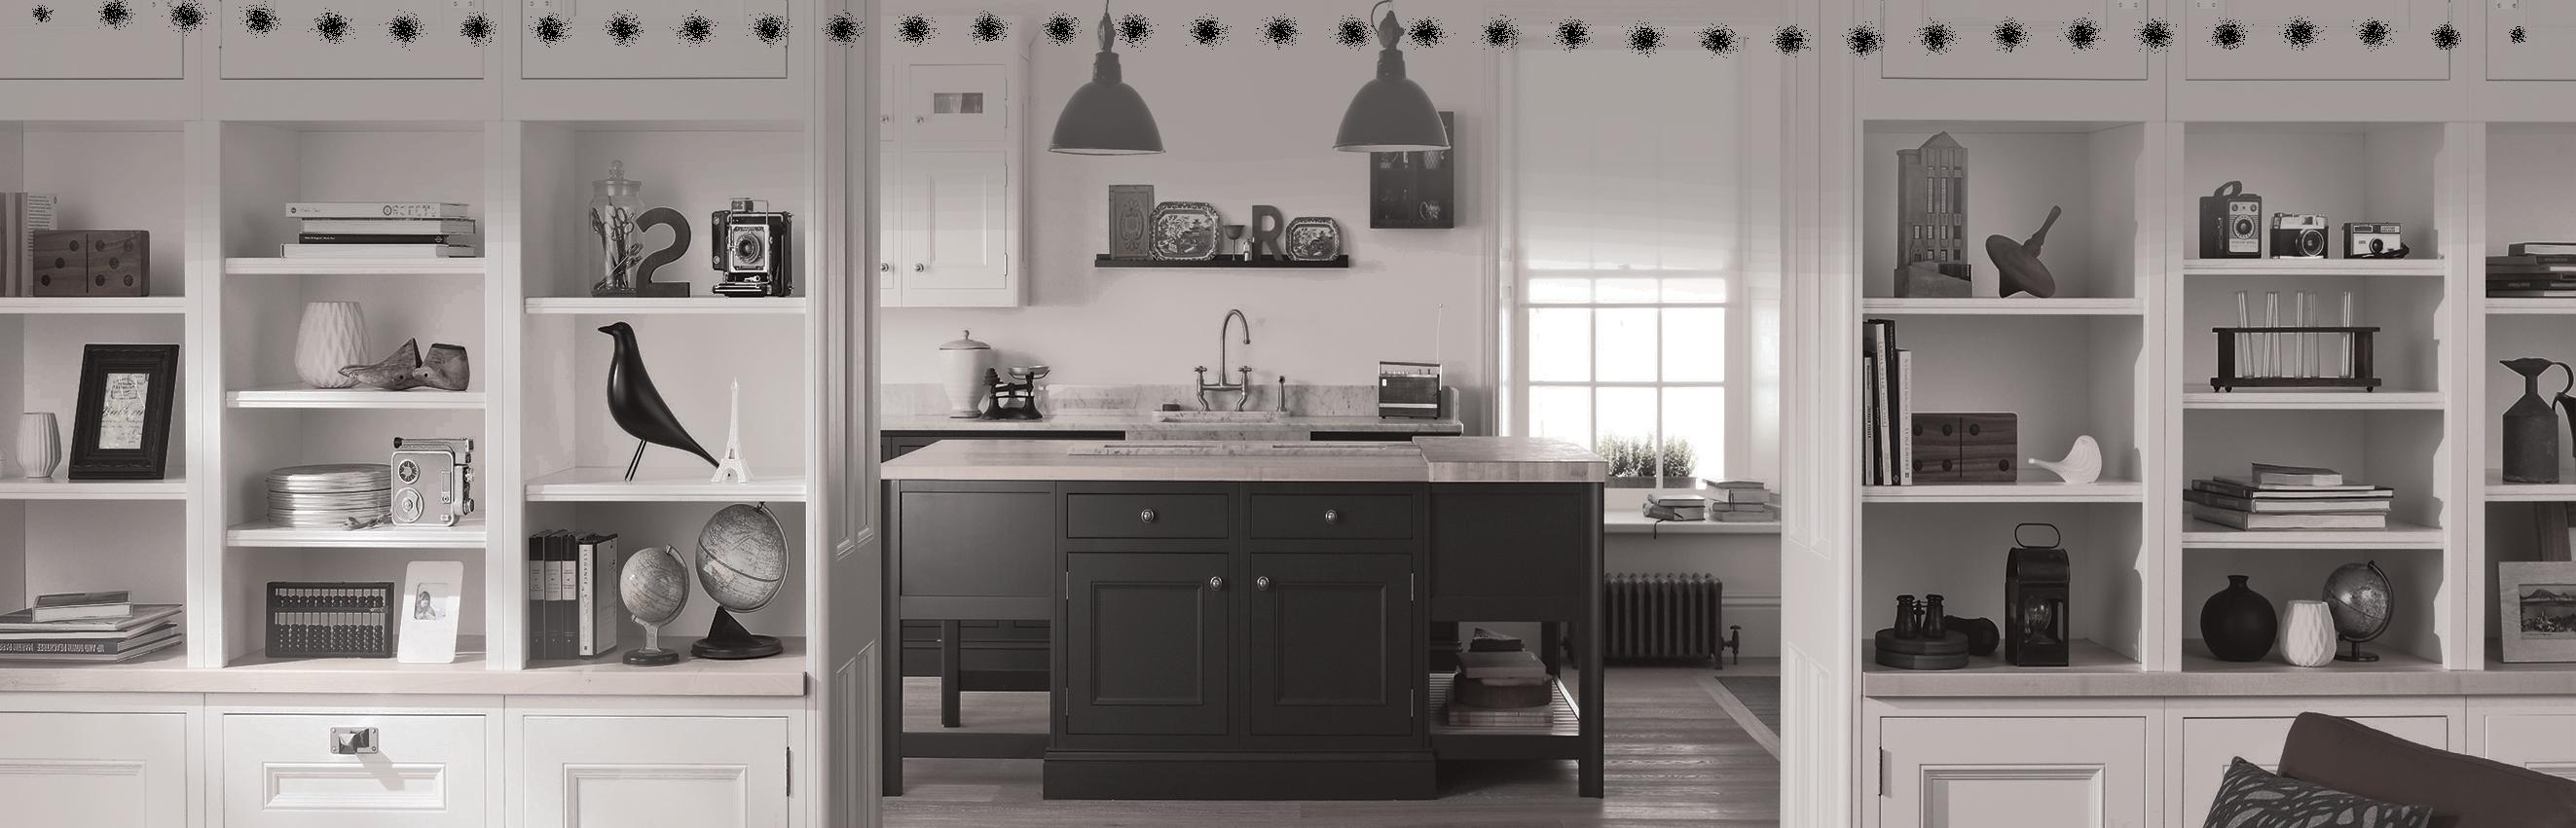 Stunning kitchens unbeatable appliances. Kitchen clipart kitchen counter